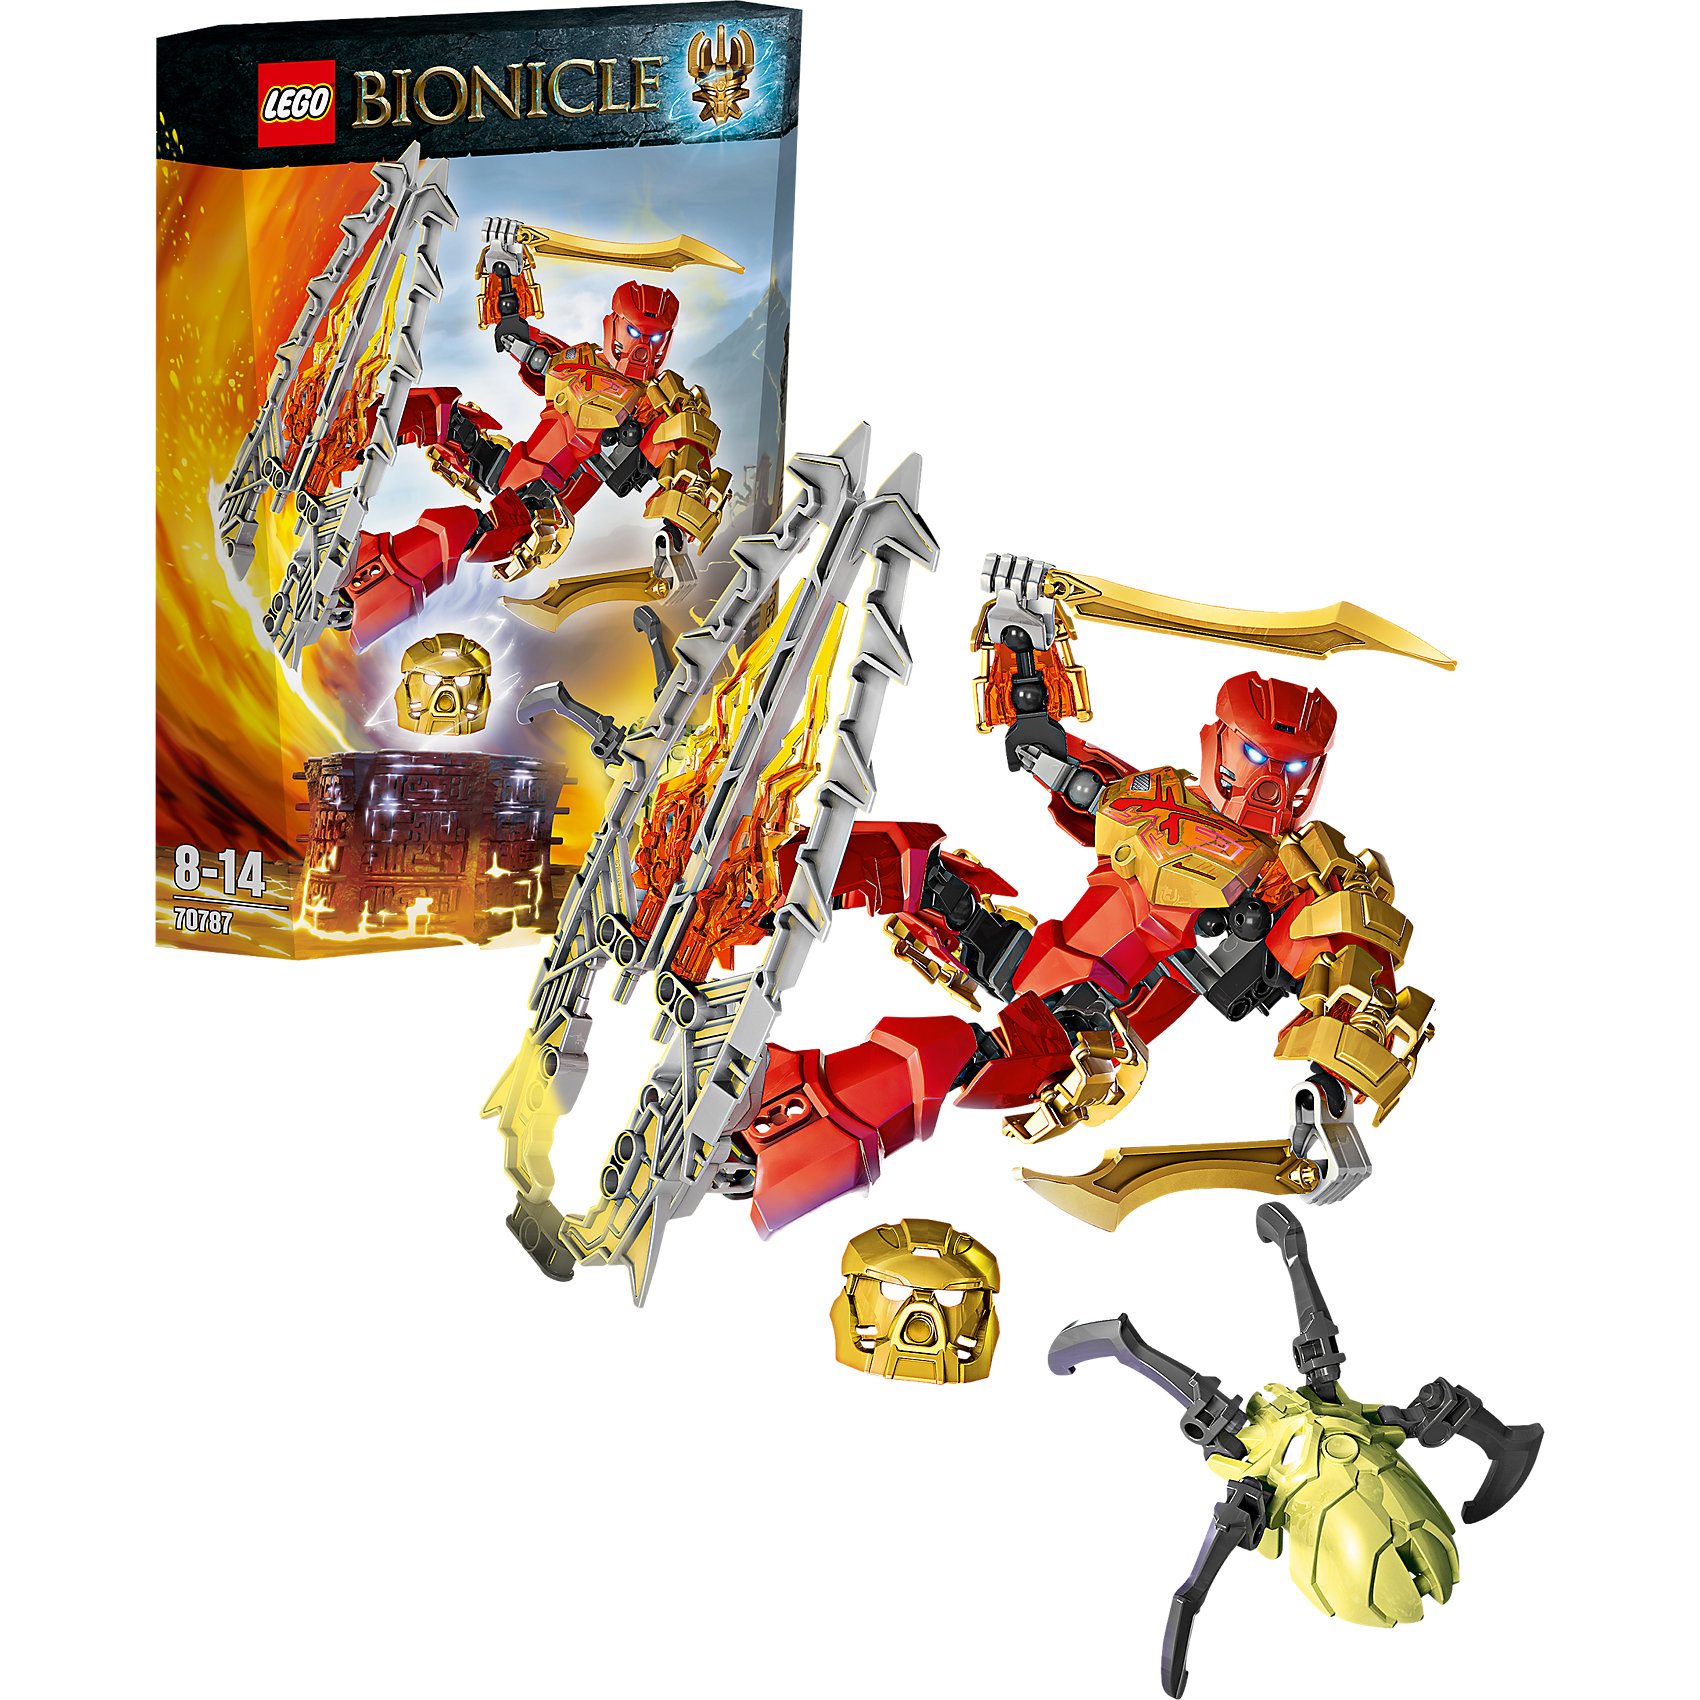 LEGO Bionicle 70787: Таху – Повелитель Огня